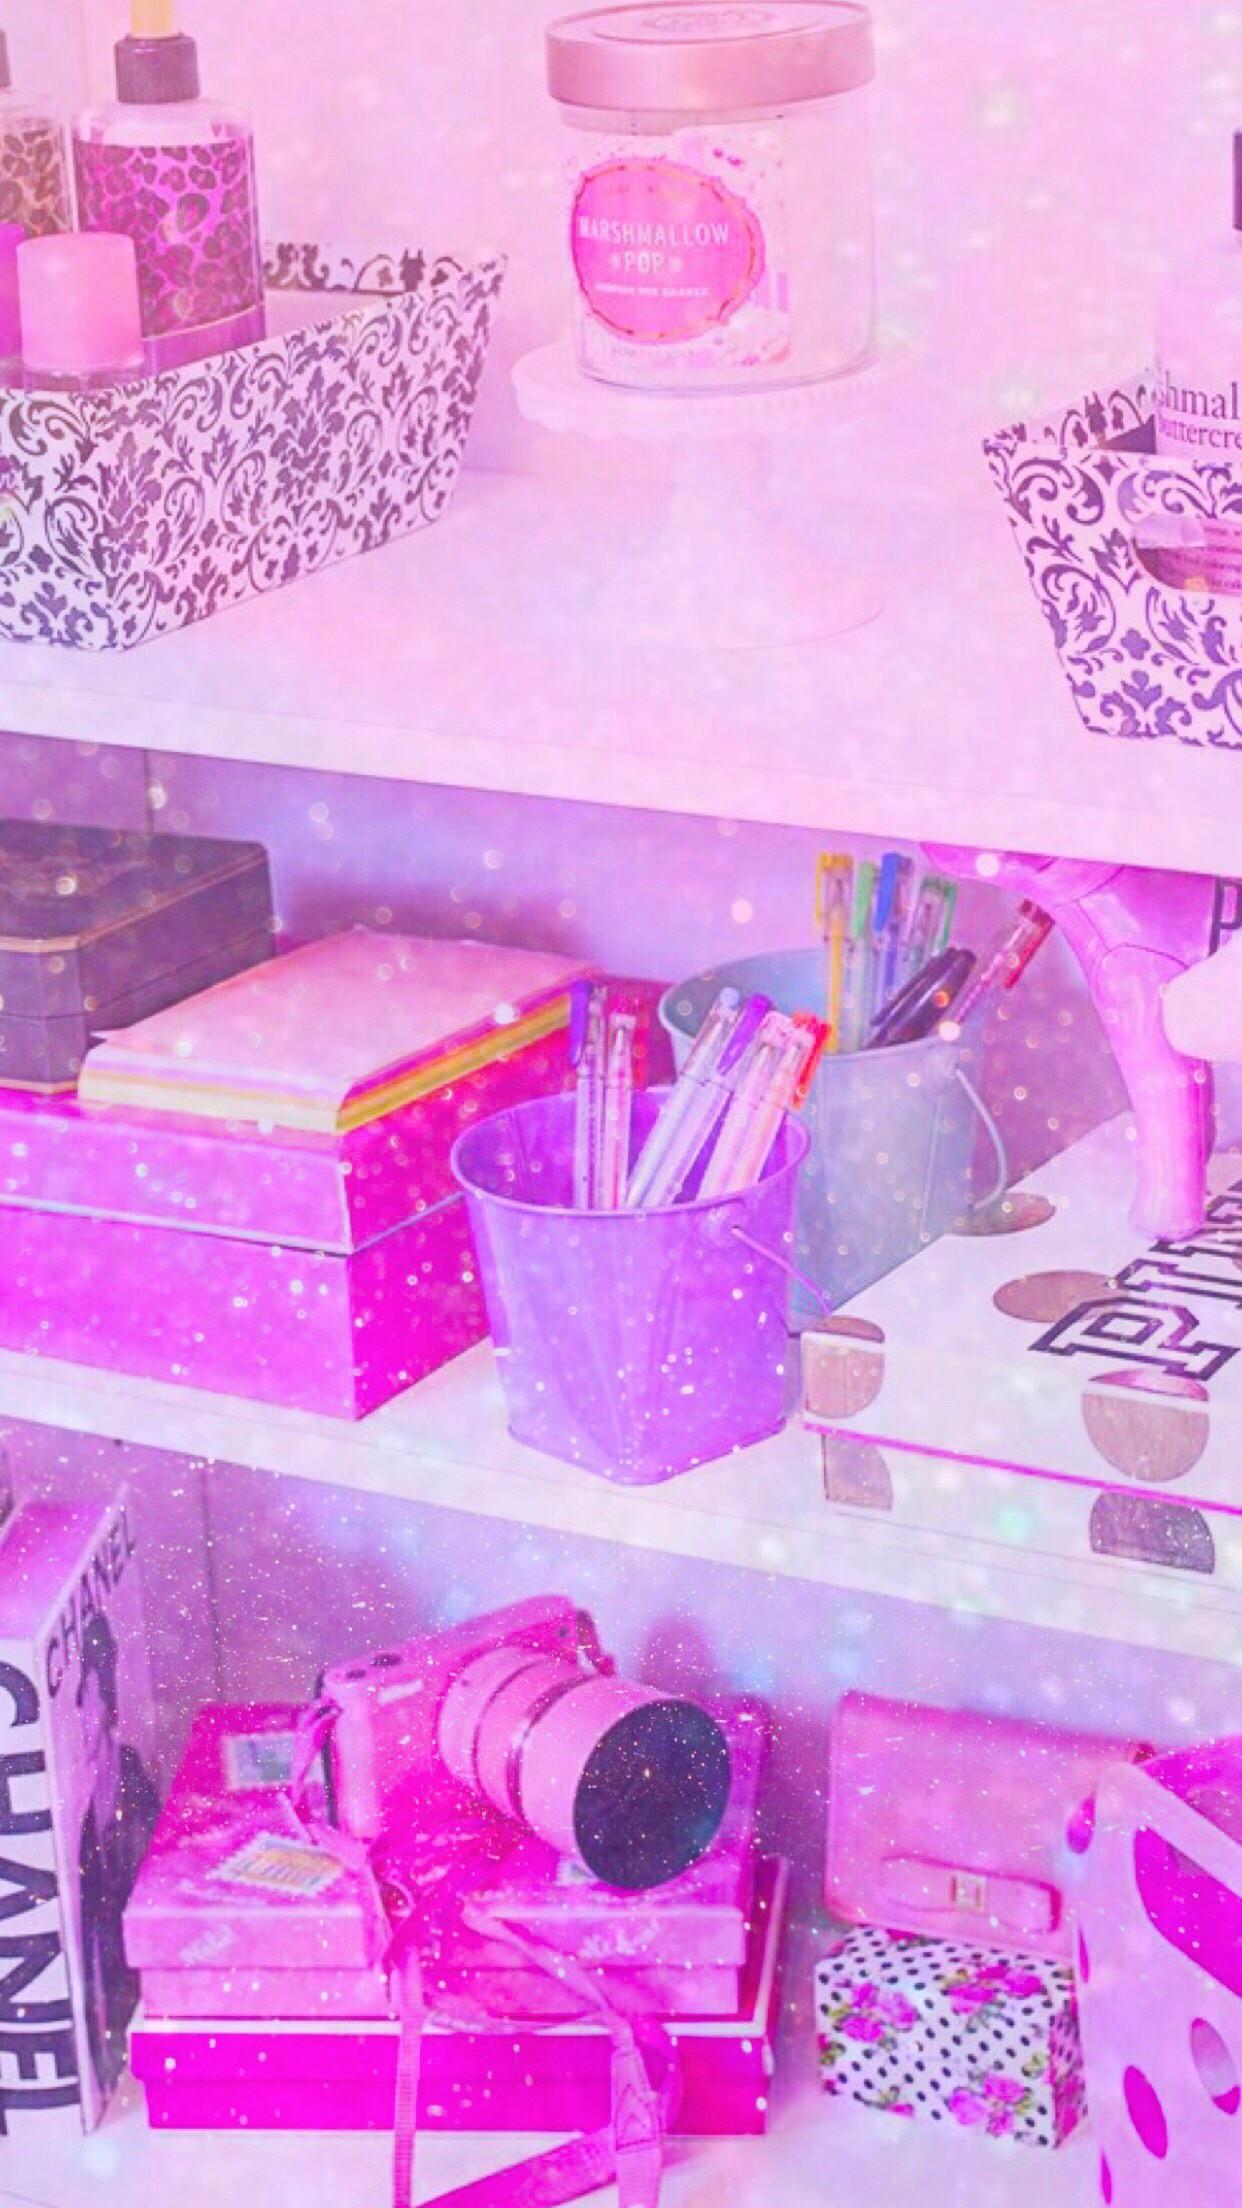 stationery, wallpaper, pink, purple, camera, HD, iphone